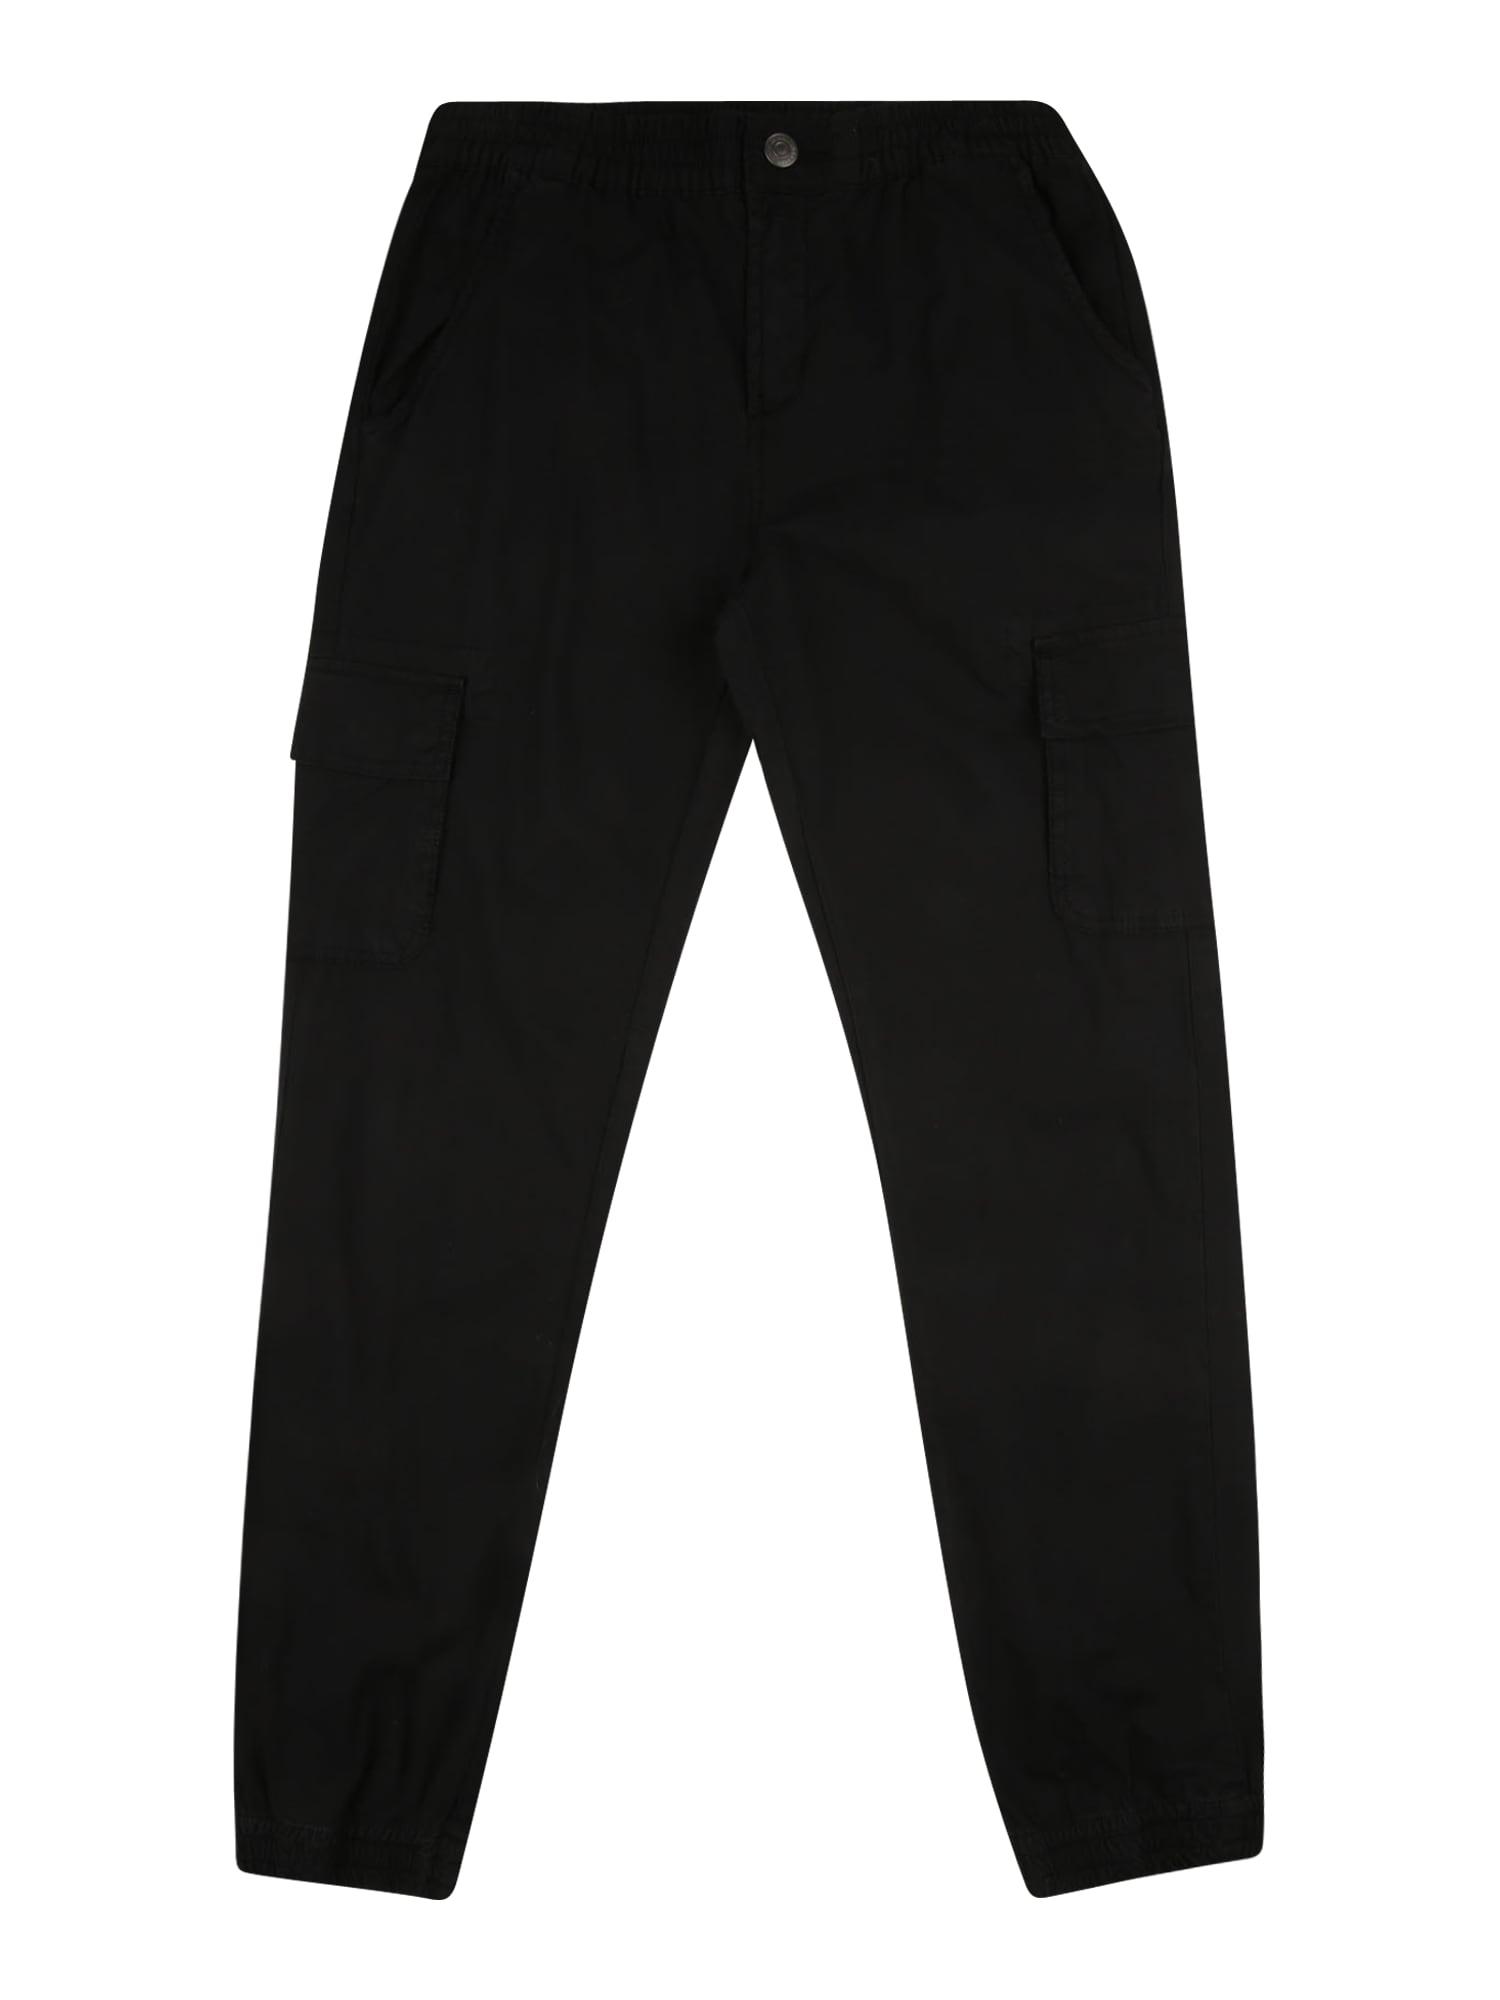 GUESS Kelnės 'POPLIN' juoda